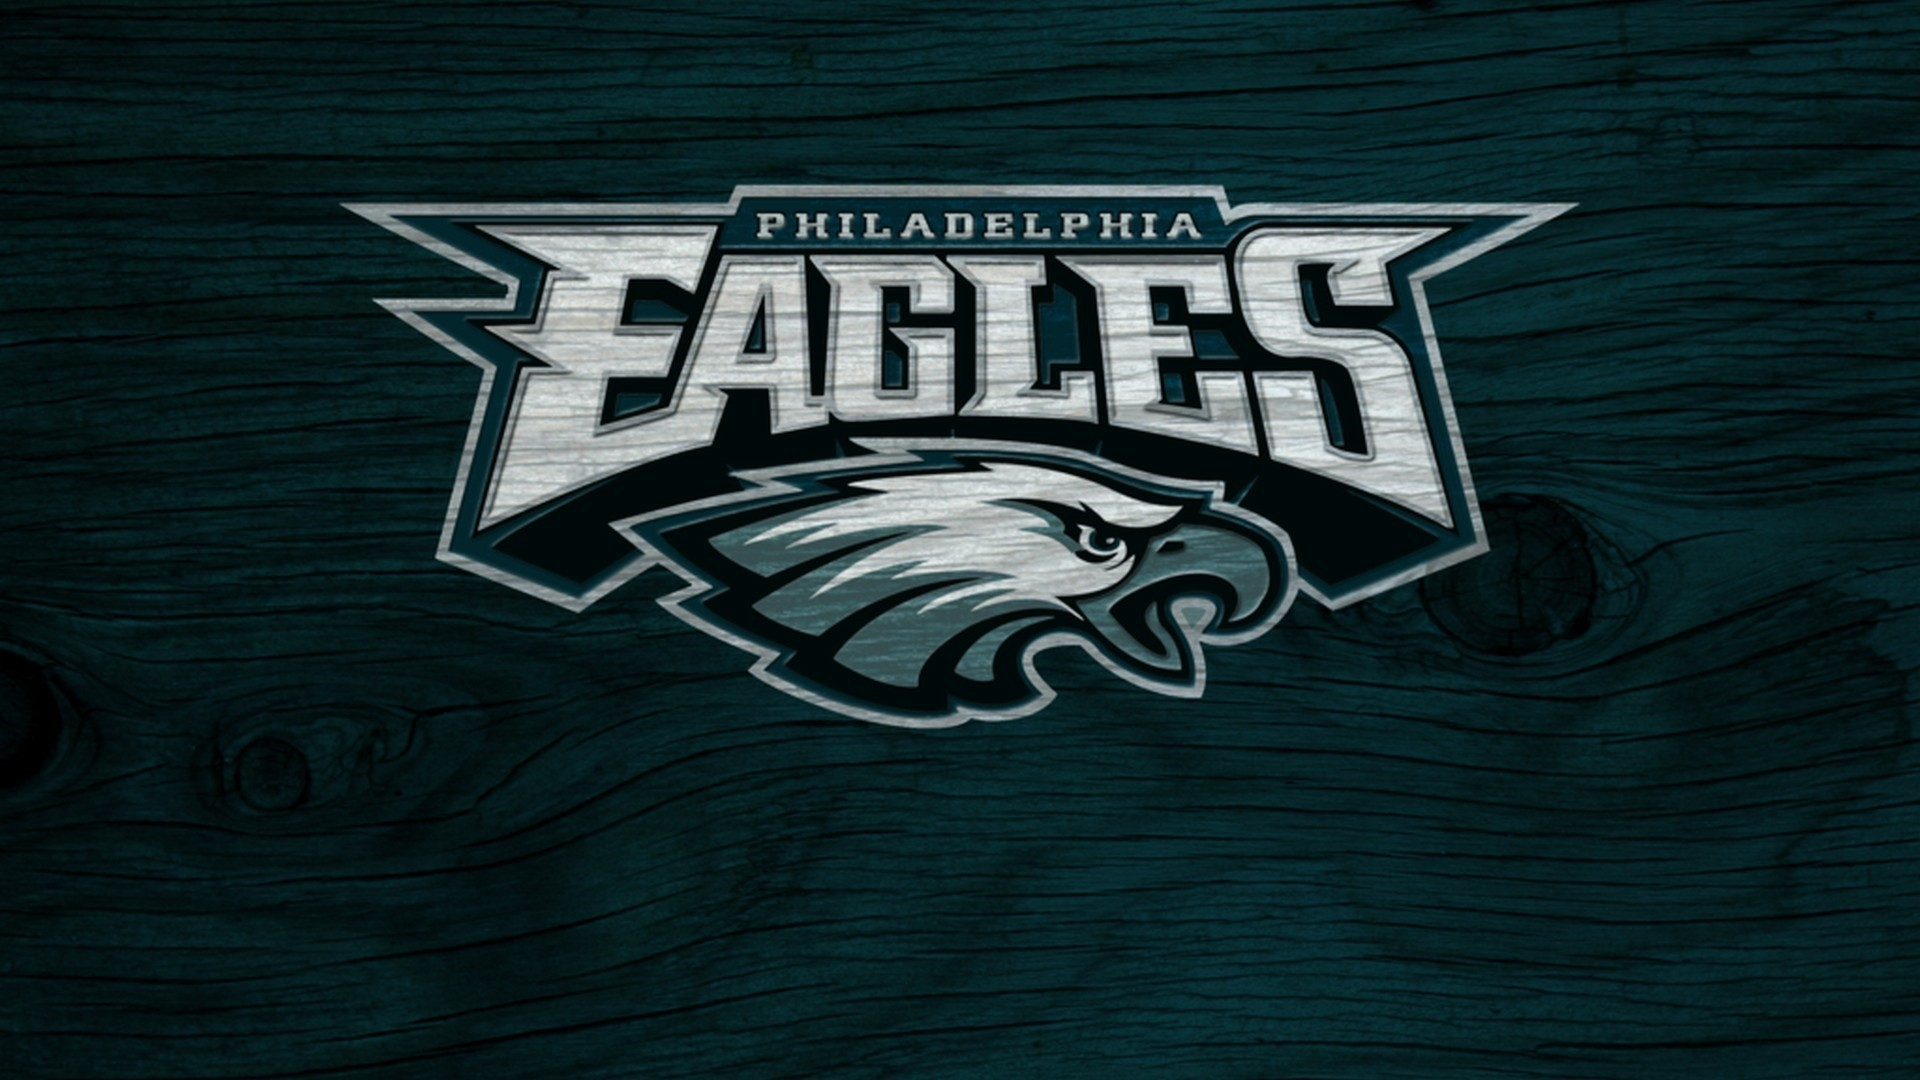 Philadelphia Eagles Image